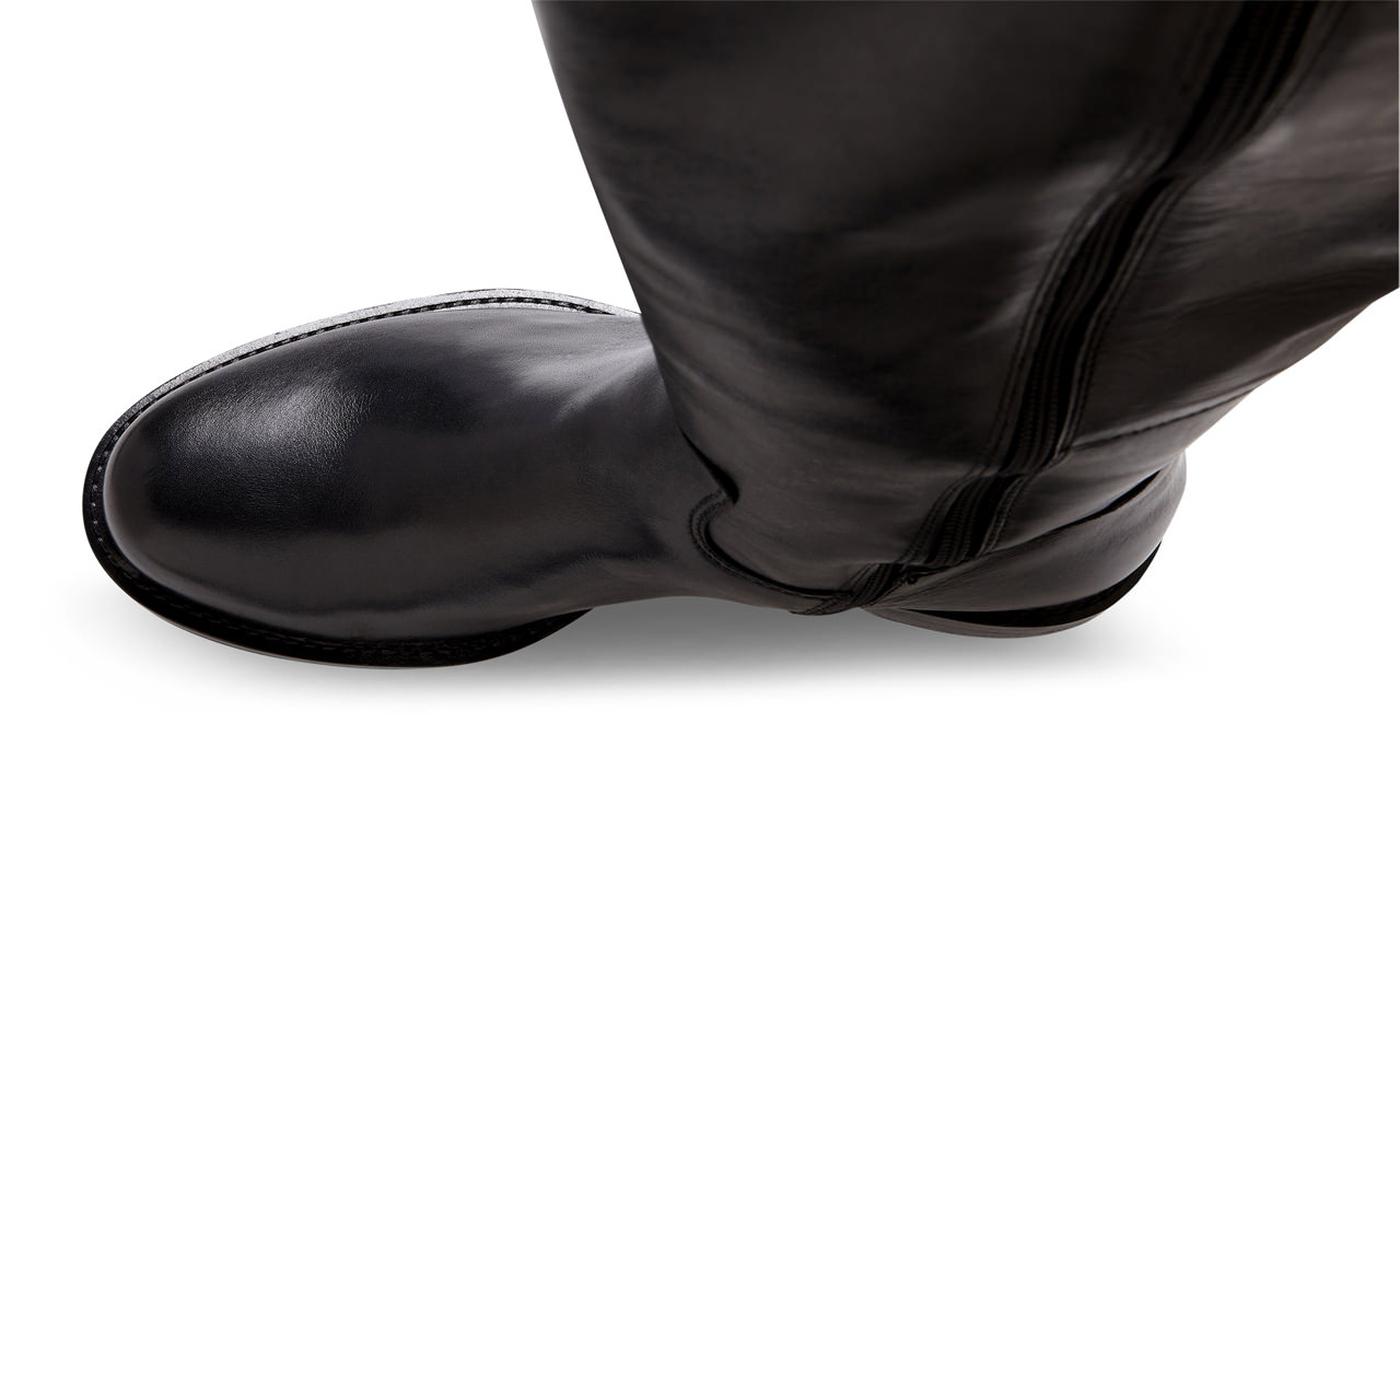 ECCO Shape 25 Riding Boot